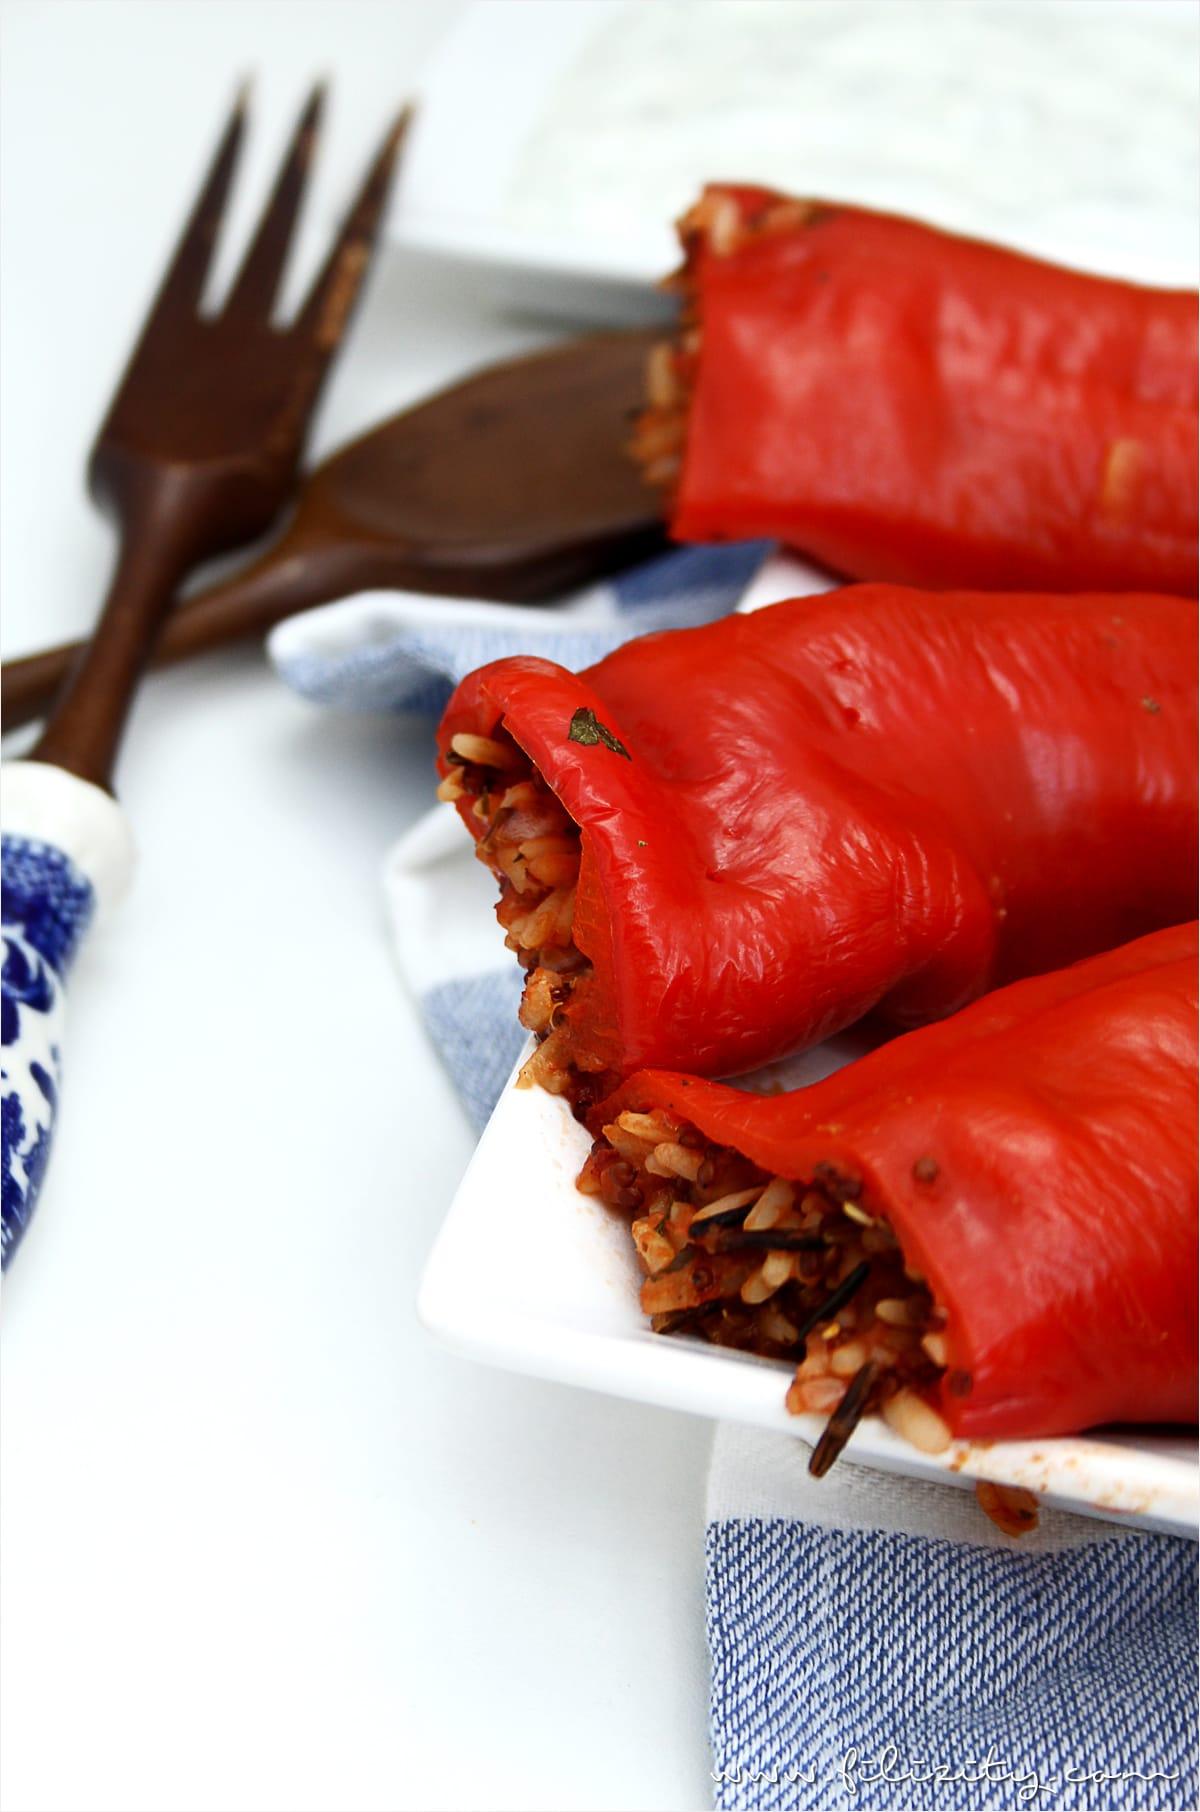 Rezept für vegan Gefüllte Paprika - mediterraner Klassiker neu interpretiert